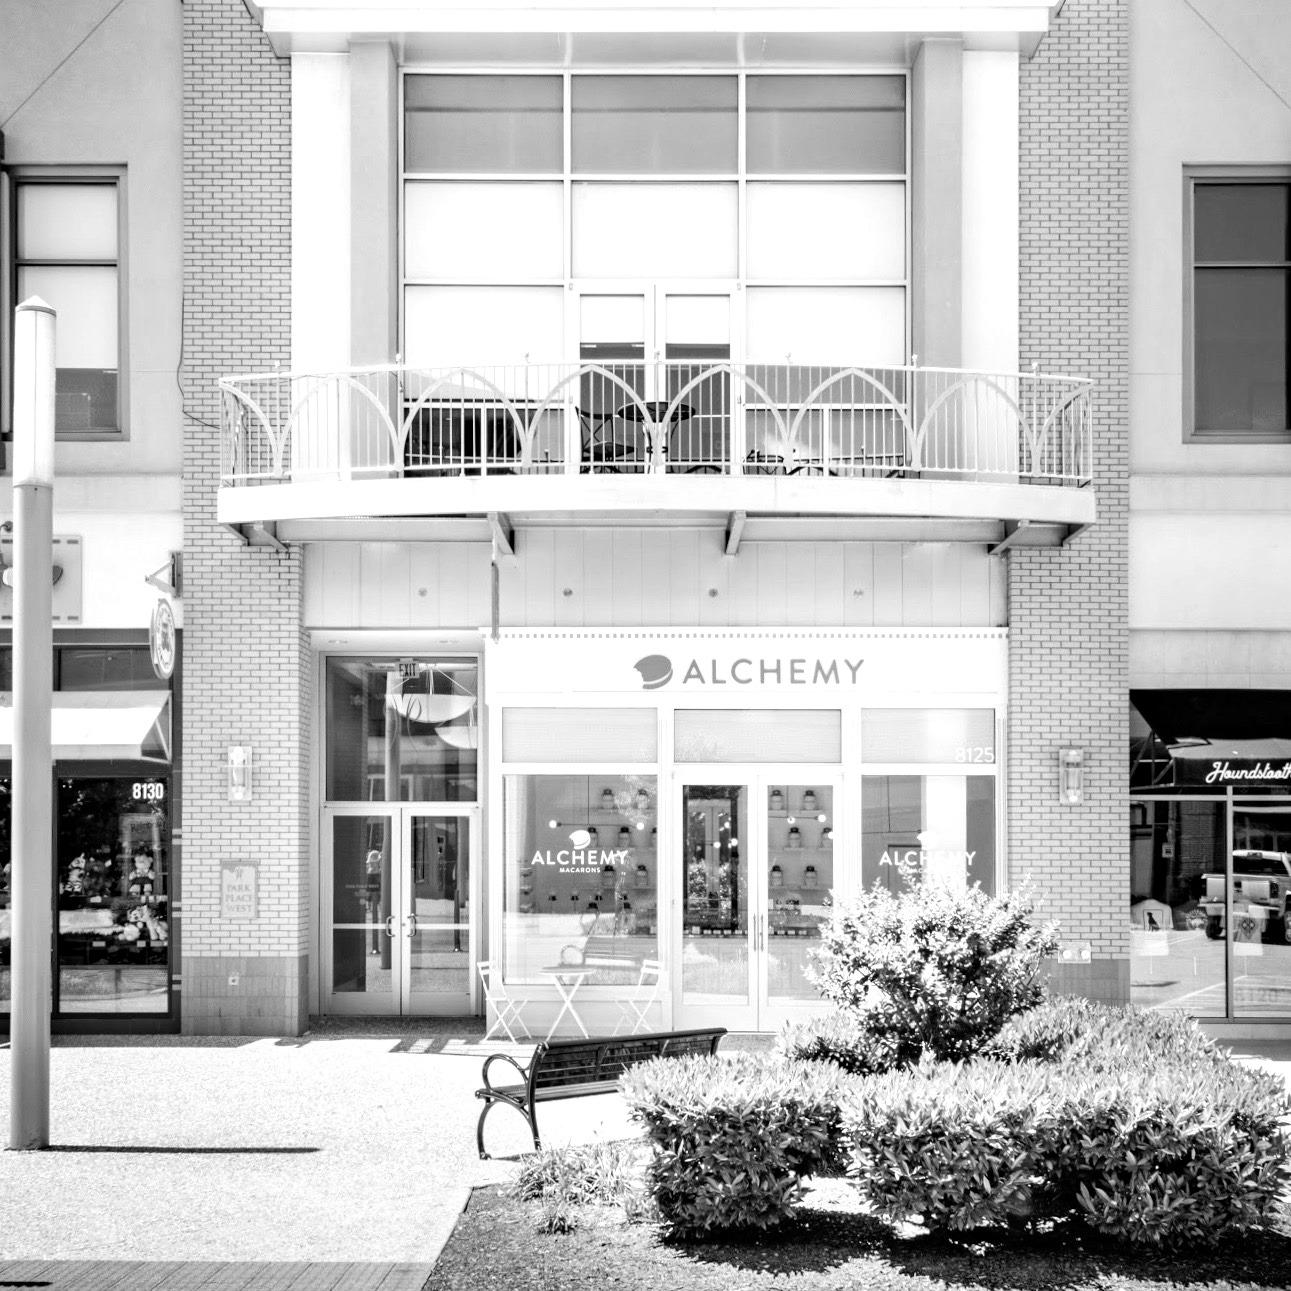 Alchemy-4_edited